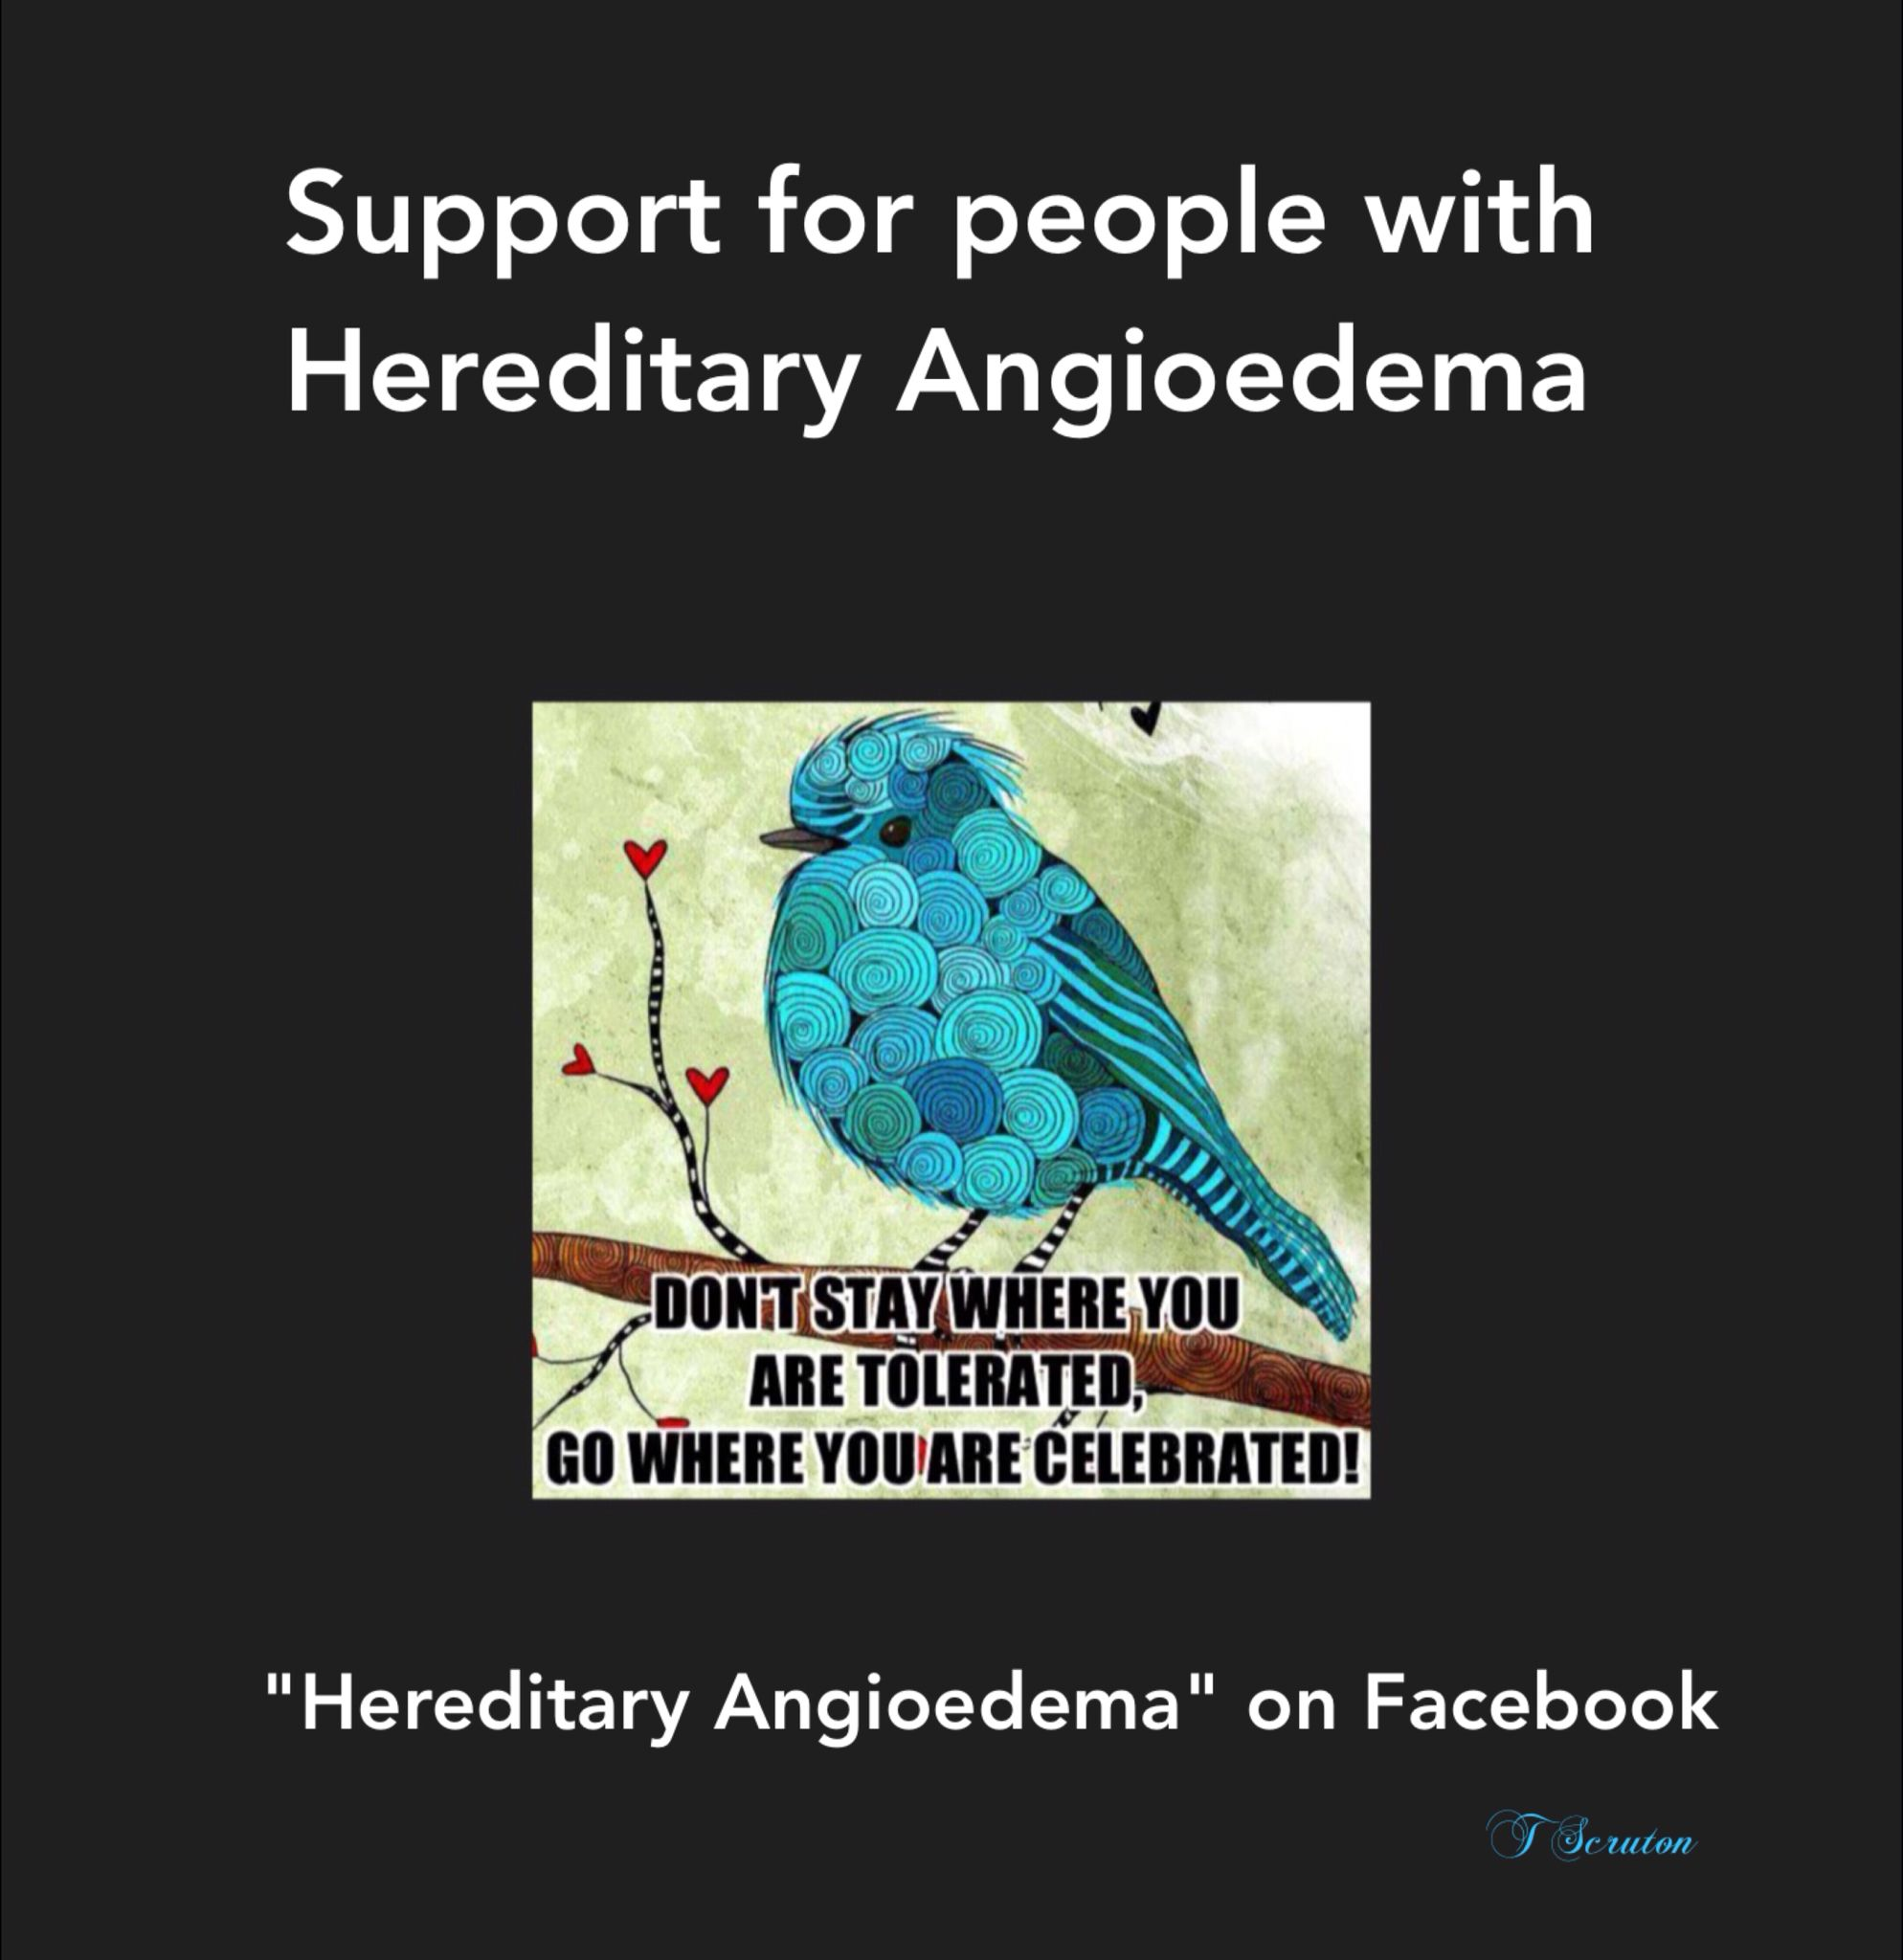 HAE, Hereditary Angioedema, chronic illness, rare disease, Facebook support group